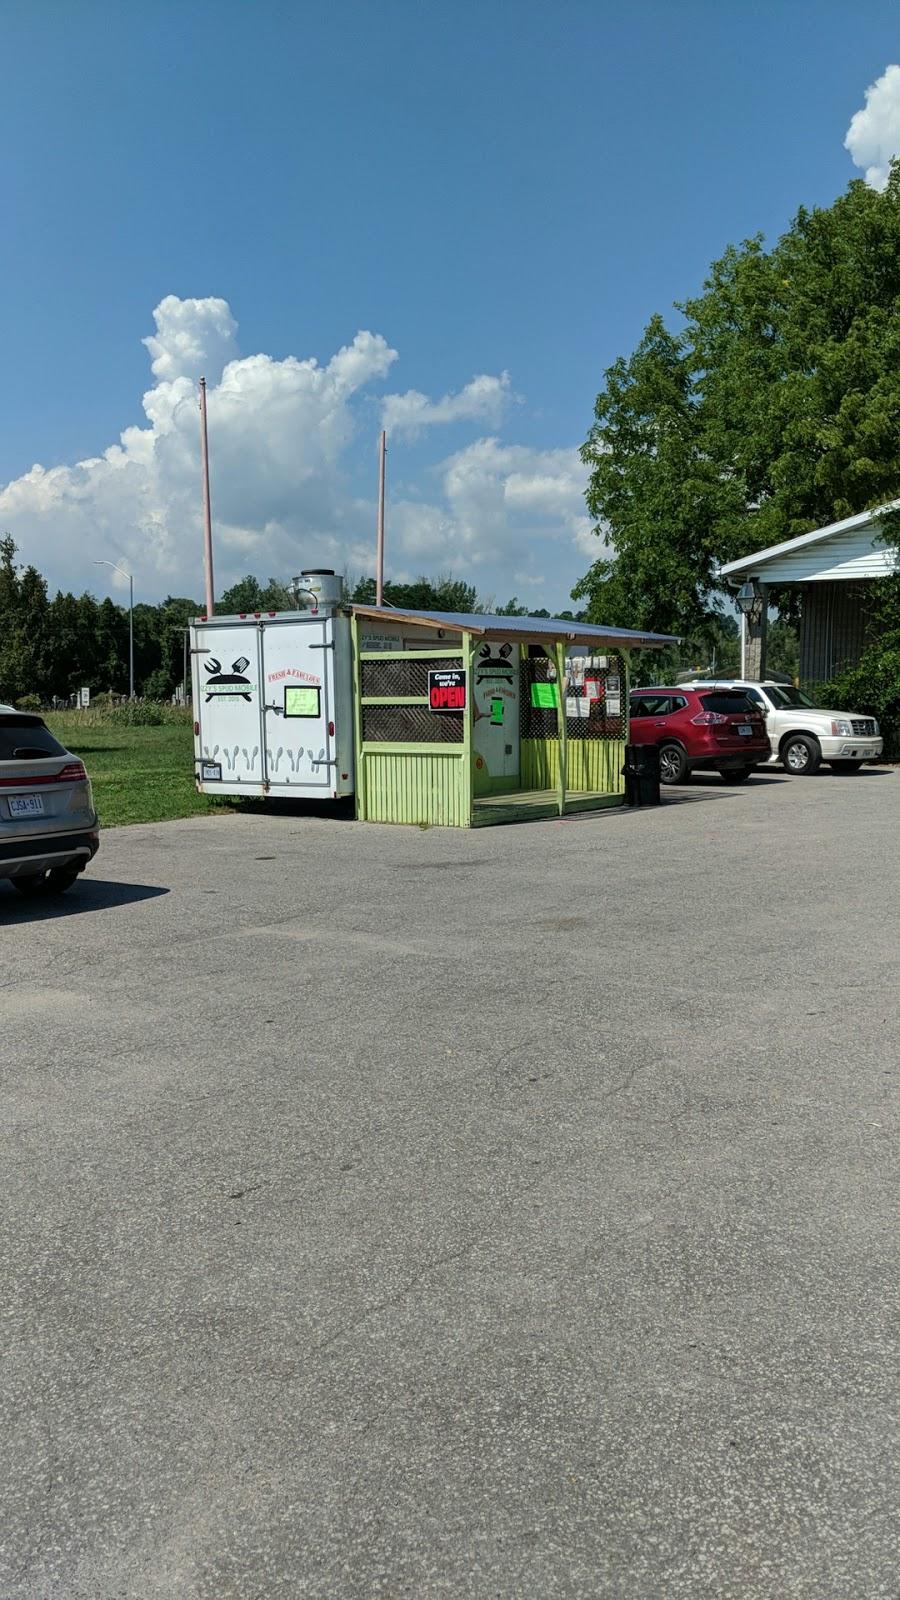 Izzys Chip Truck   restaurant   Cramahe, ON K0K 1S0, Canada   9053768168 OR +1 905-376-8168